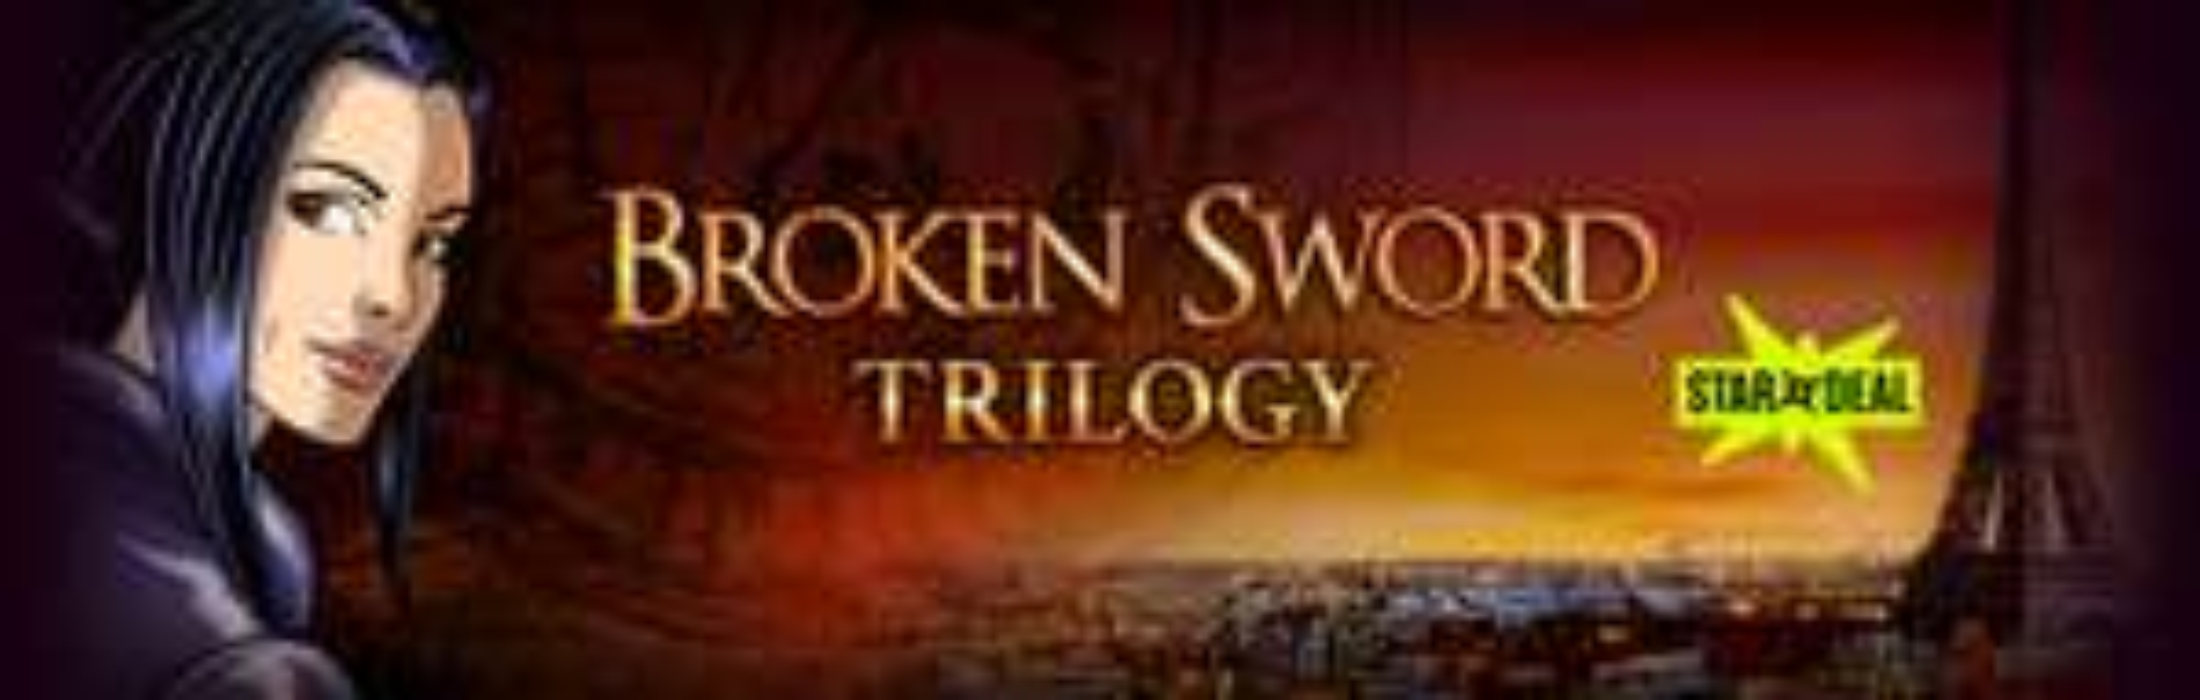 Bundlestars/Steam: Broken Sword Trilogy um 1€